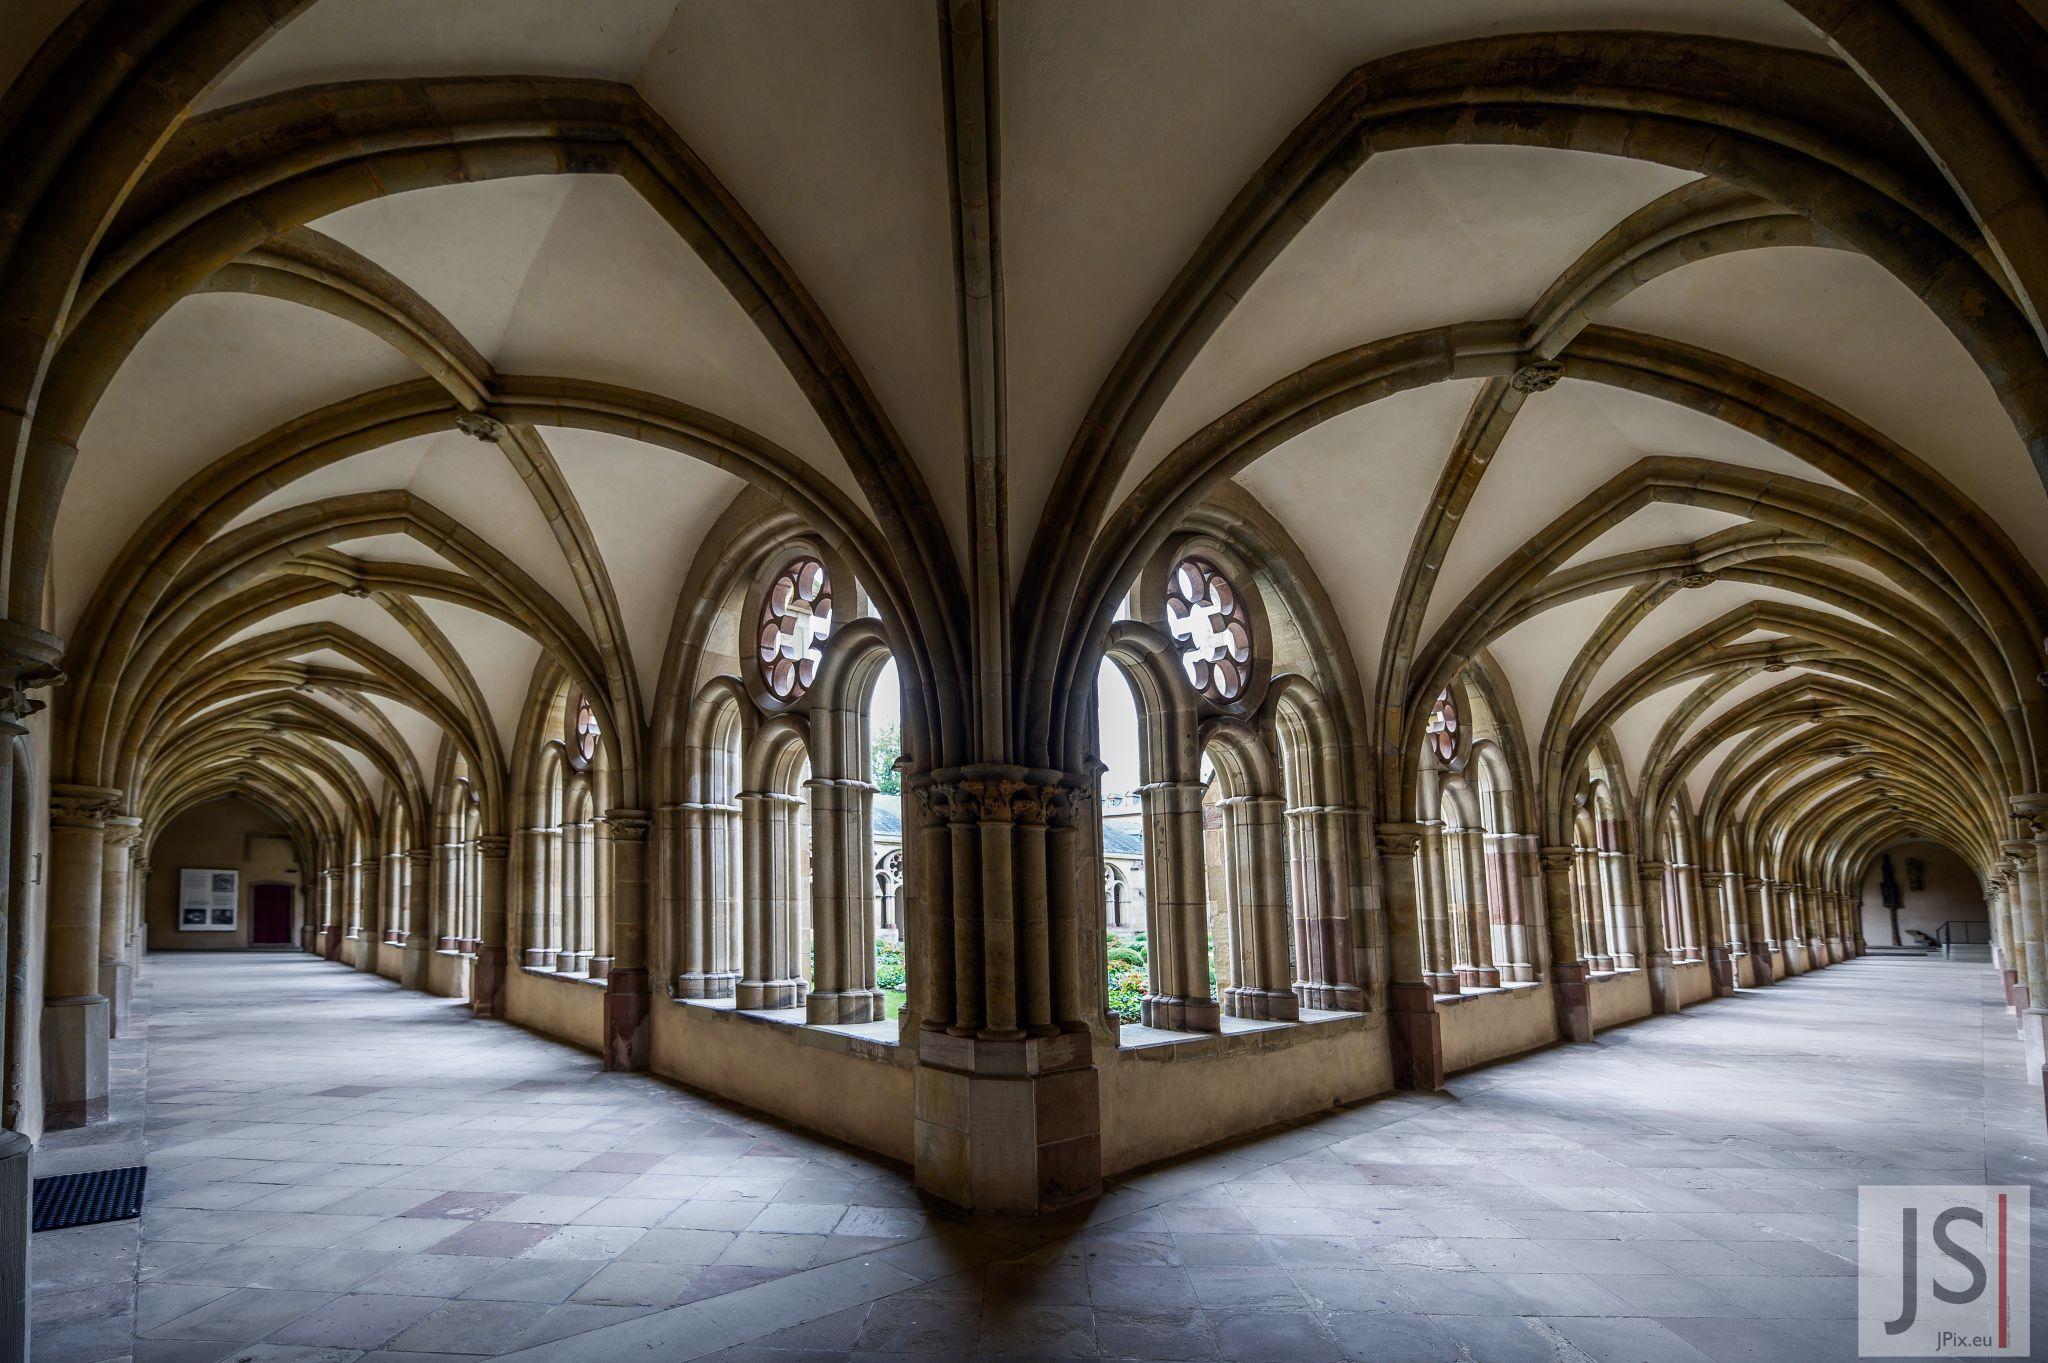 Dom (Trier) - Domkreuzgang, Germany